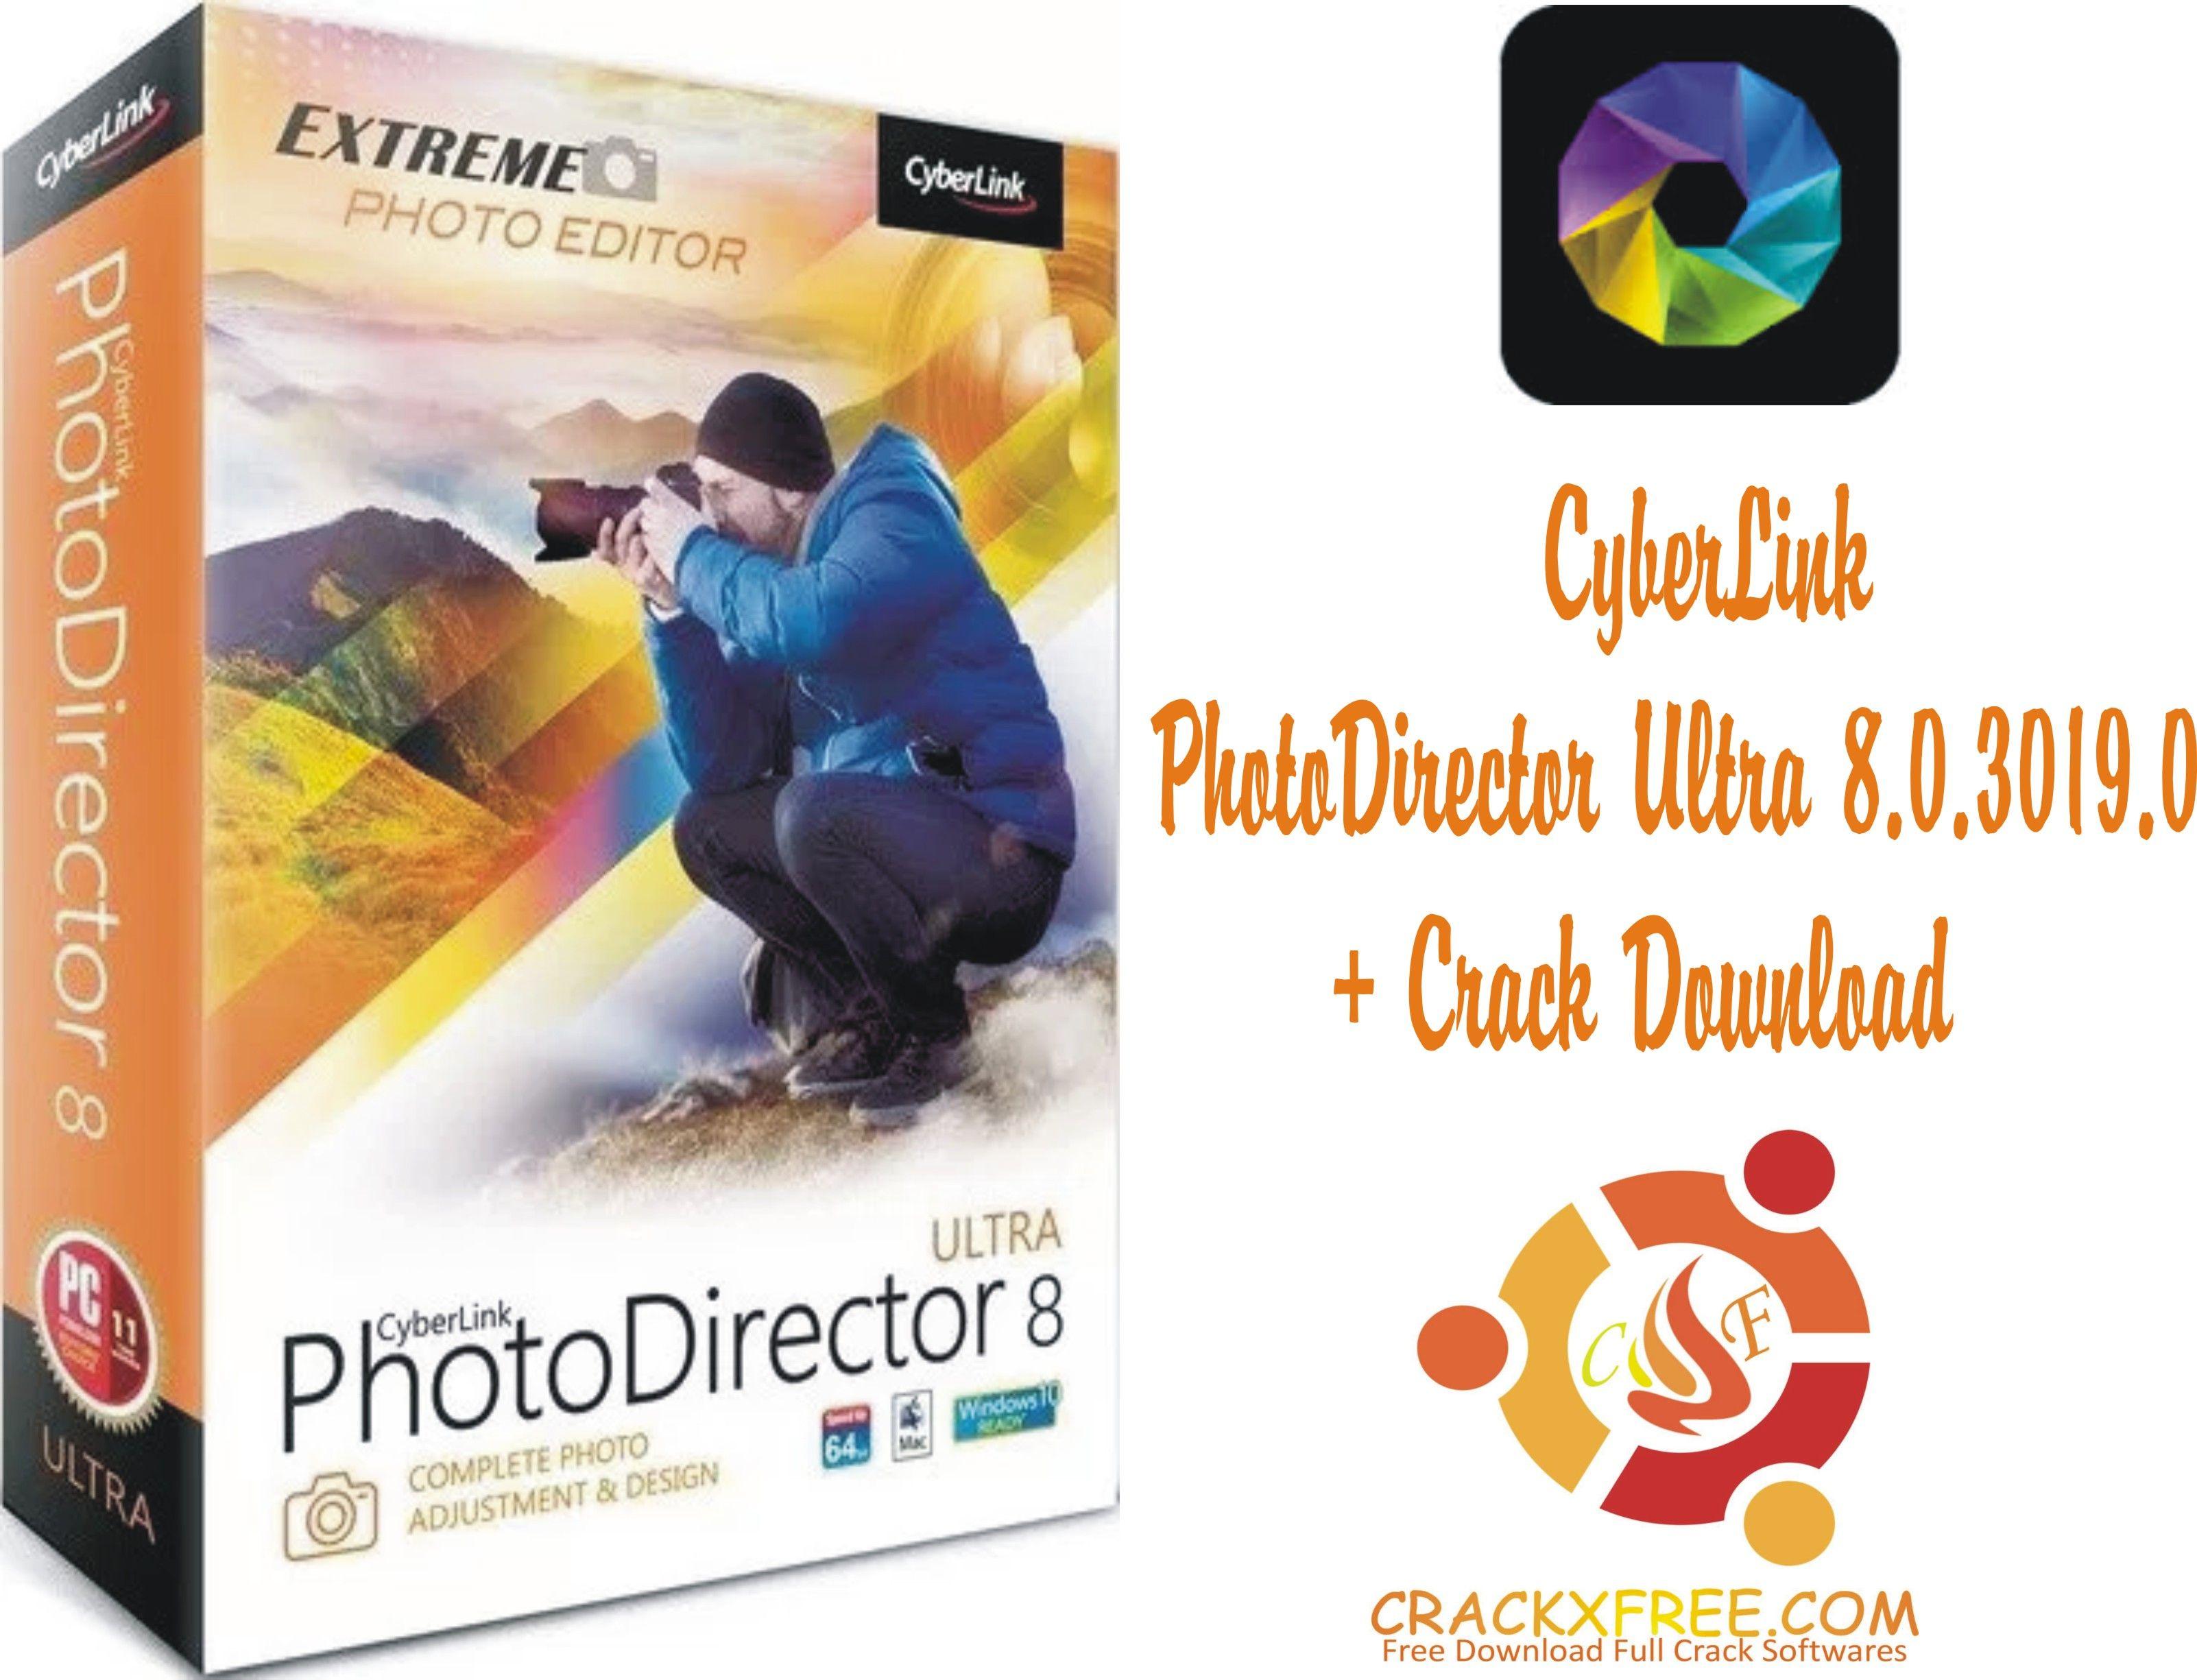 CyberLink PhotoDirector Ultra 8.0.3019.0 + Crack Download,CyberLink PhotoDirector Ultra 8.0.3019.0,CyberLink PhotoDirector + Crack Download.................